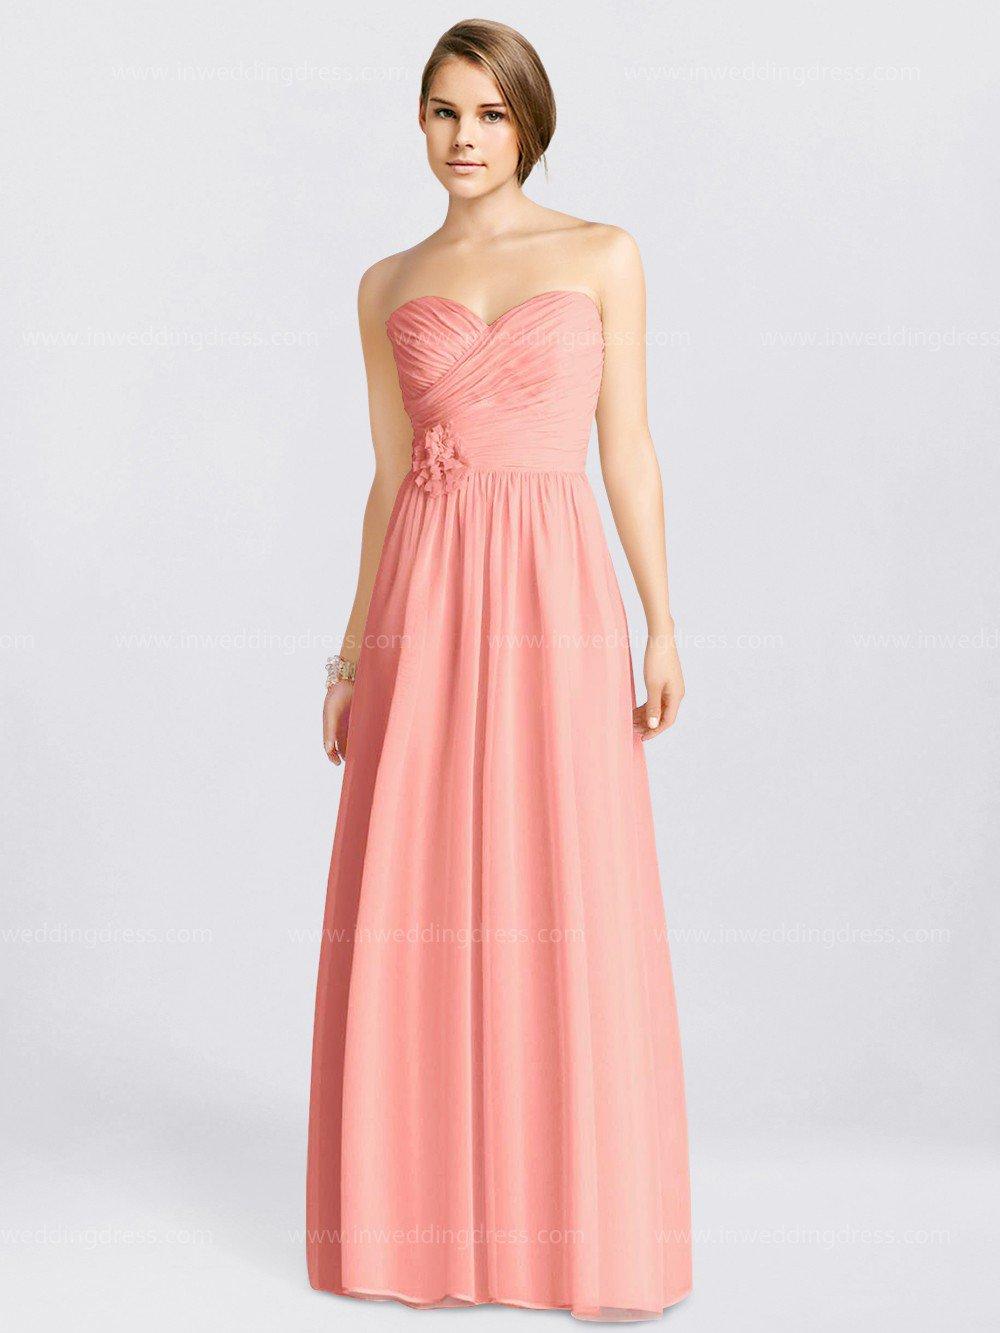 Modest Chiffon Sweetheart Wedding Party Dress Australia